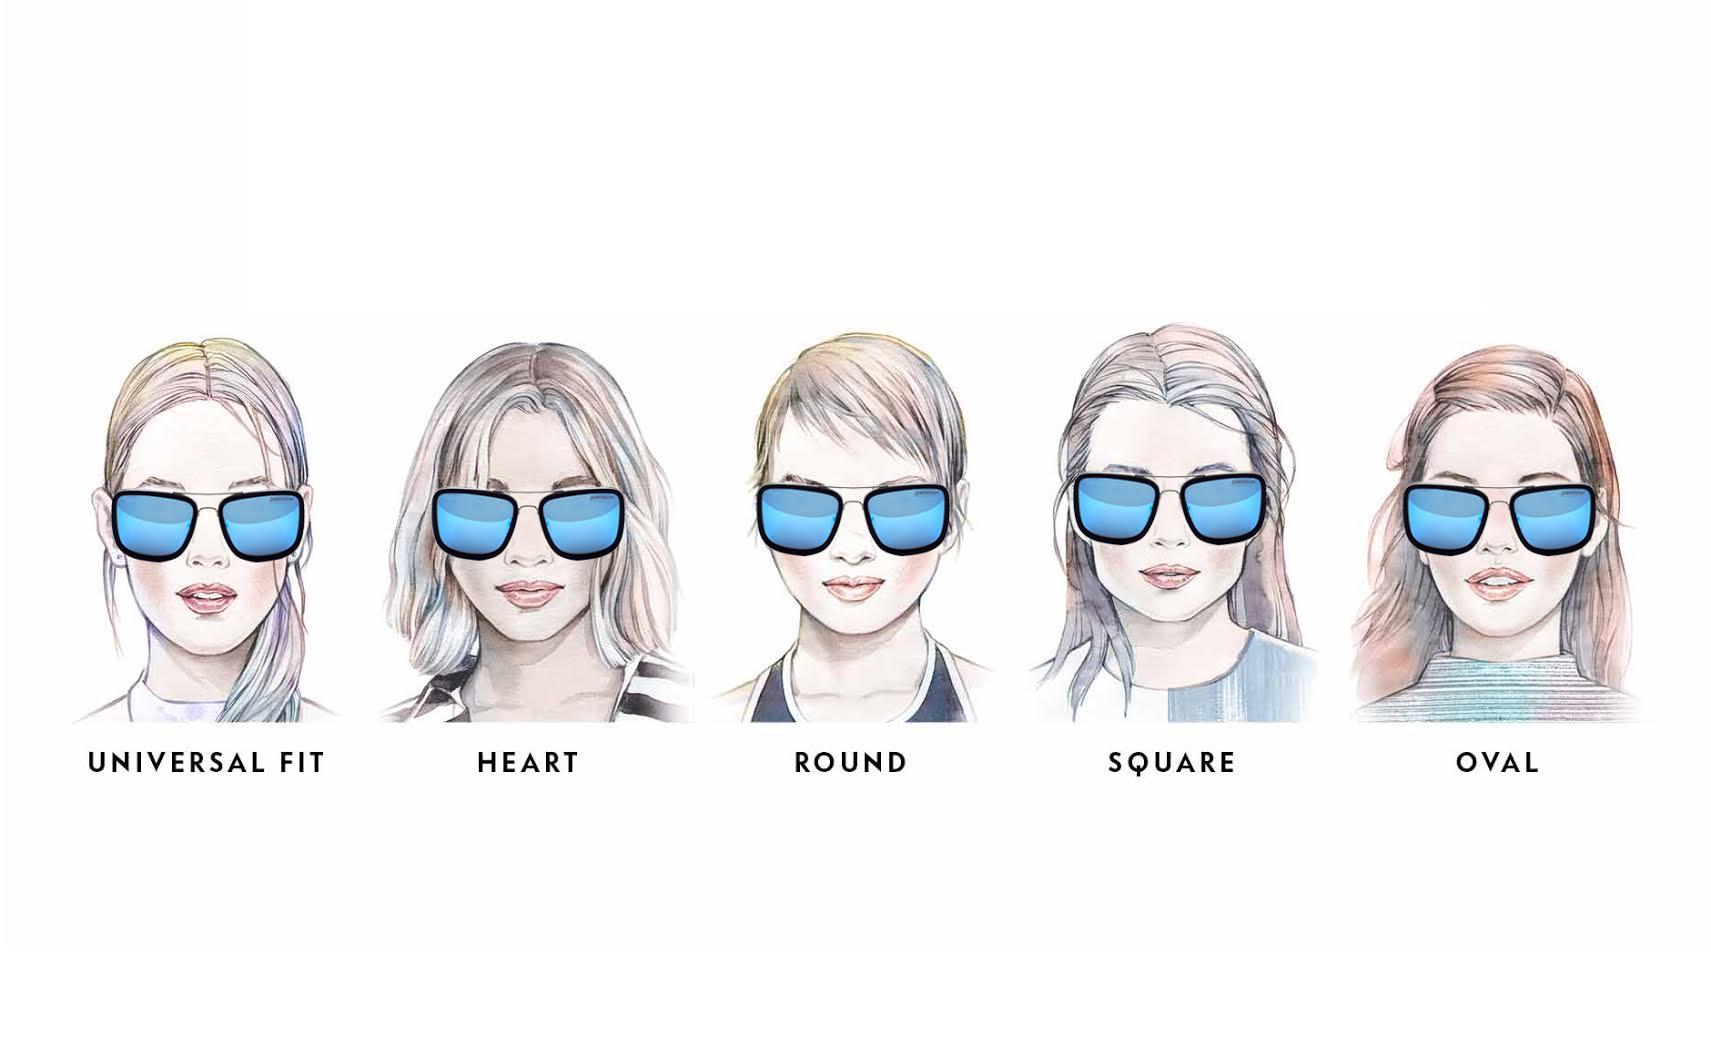 Cube 在各種女生臉型 ( 百搭臉, 心型臉, 圓臉, 方形臉, 鵝蛋臉 )